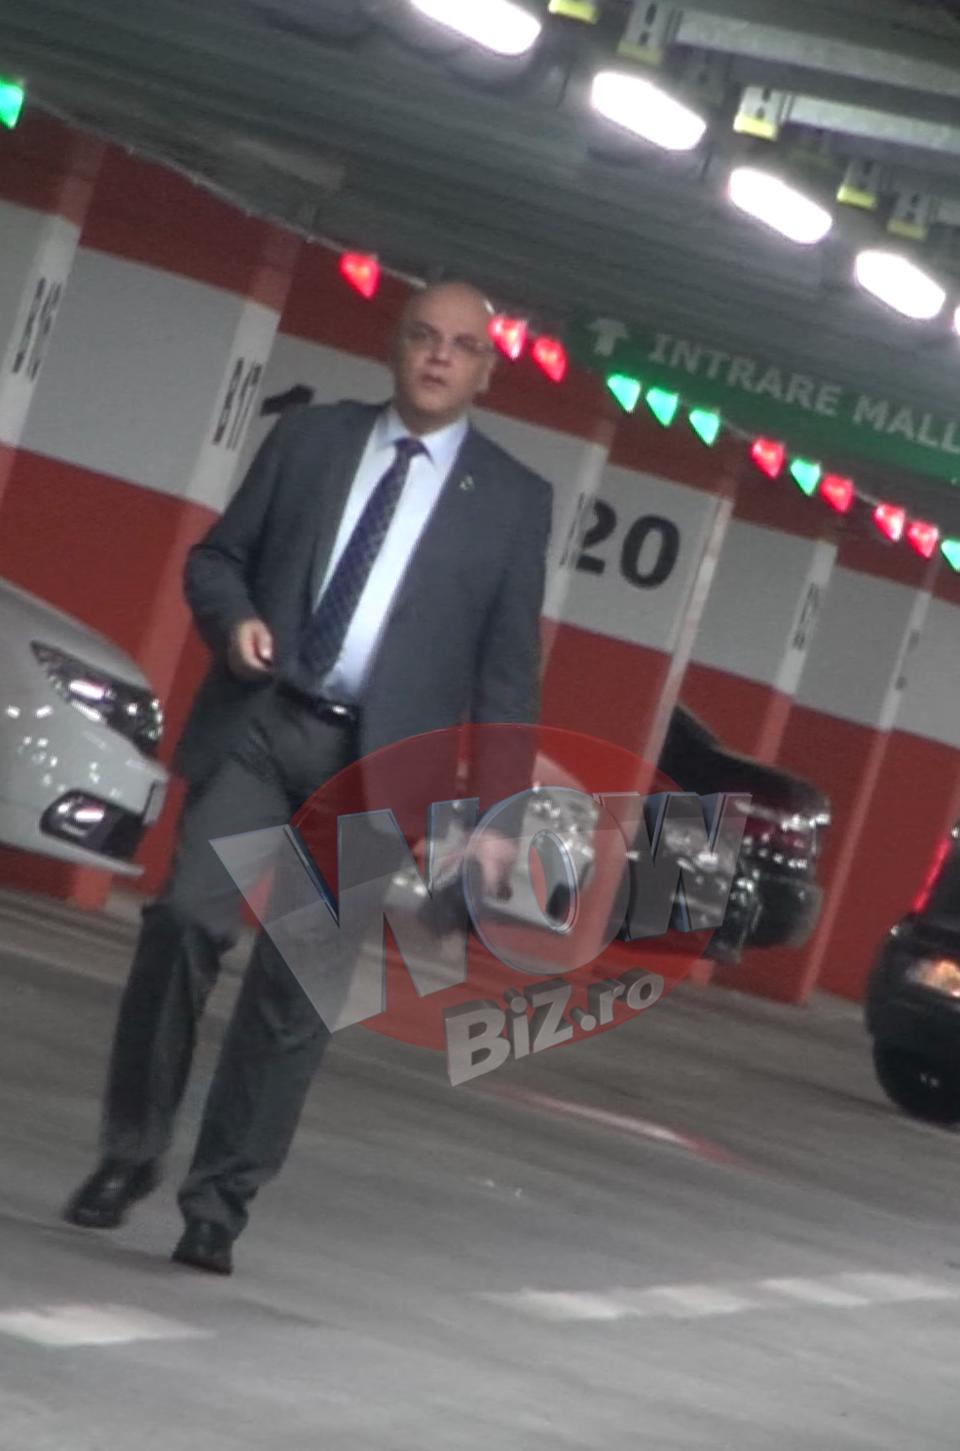 Bine ca nu-i in misiune! Doctore, unde ti-ai lasat masina? Raed Arafat a uitat unde si-a pus autoturismul si se plimba dezorientat minute bune prin parcare! VIDEO EXCLUSIV